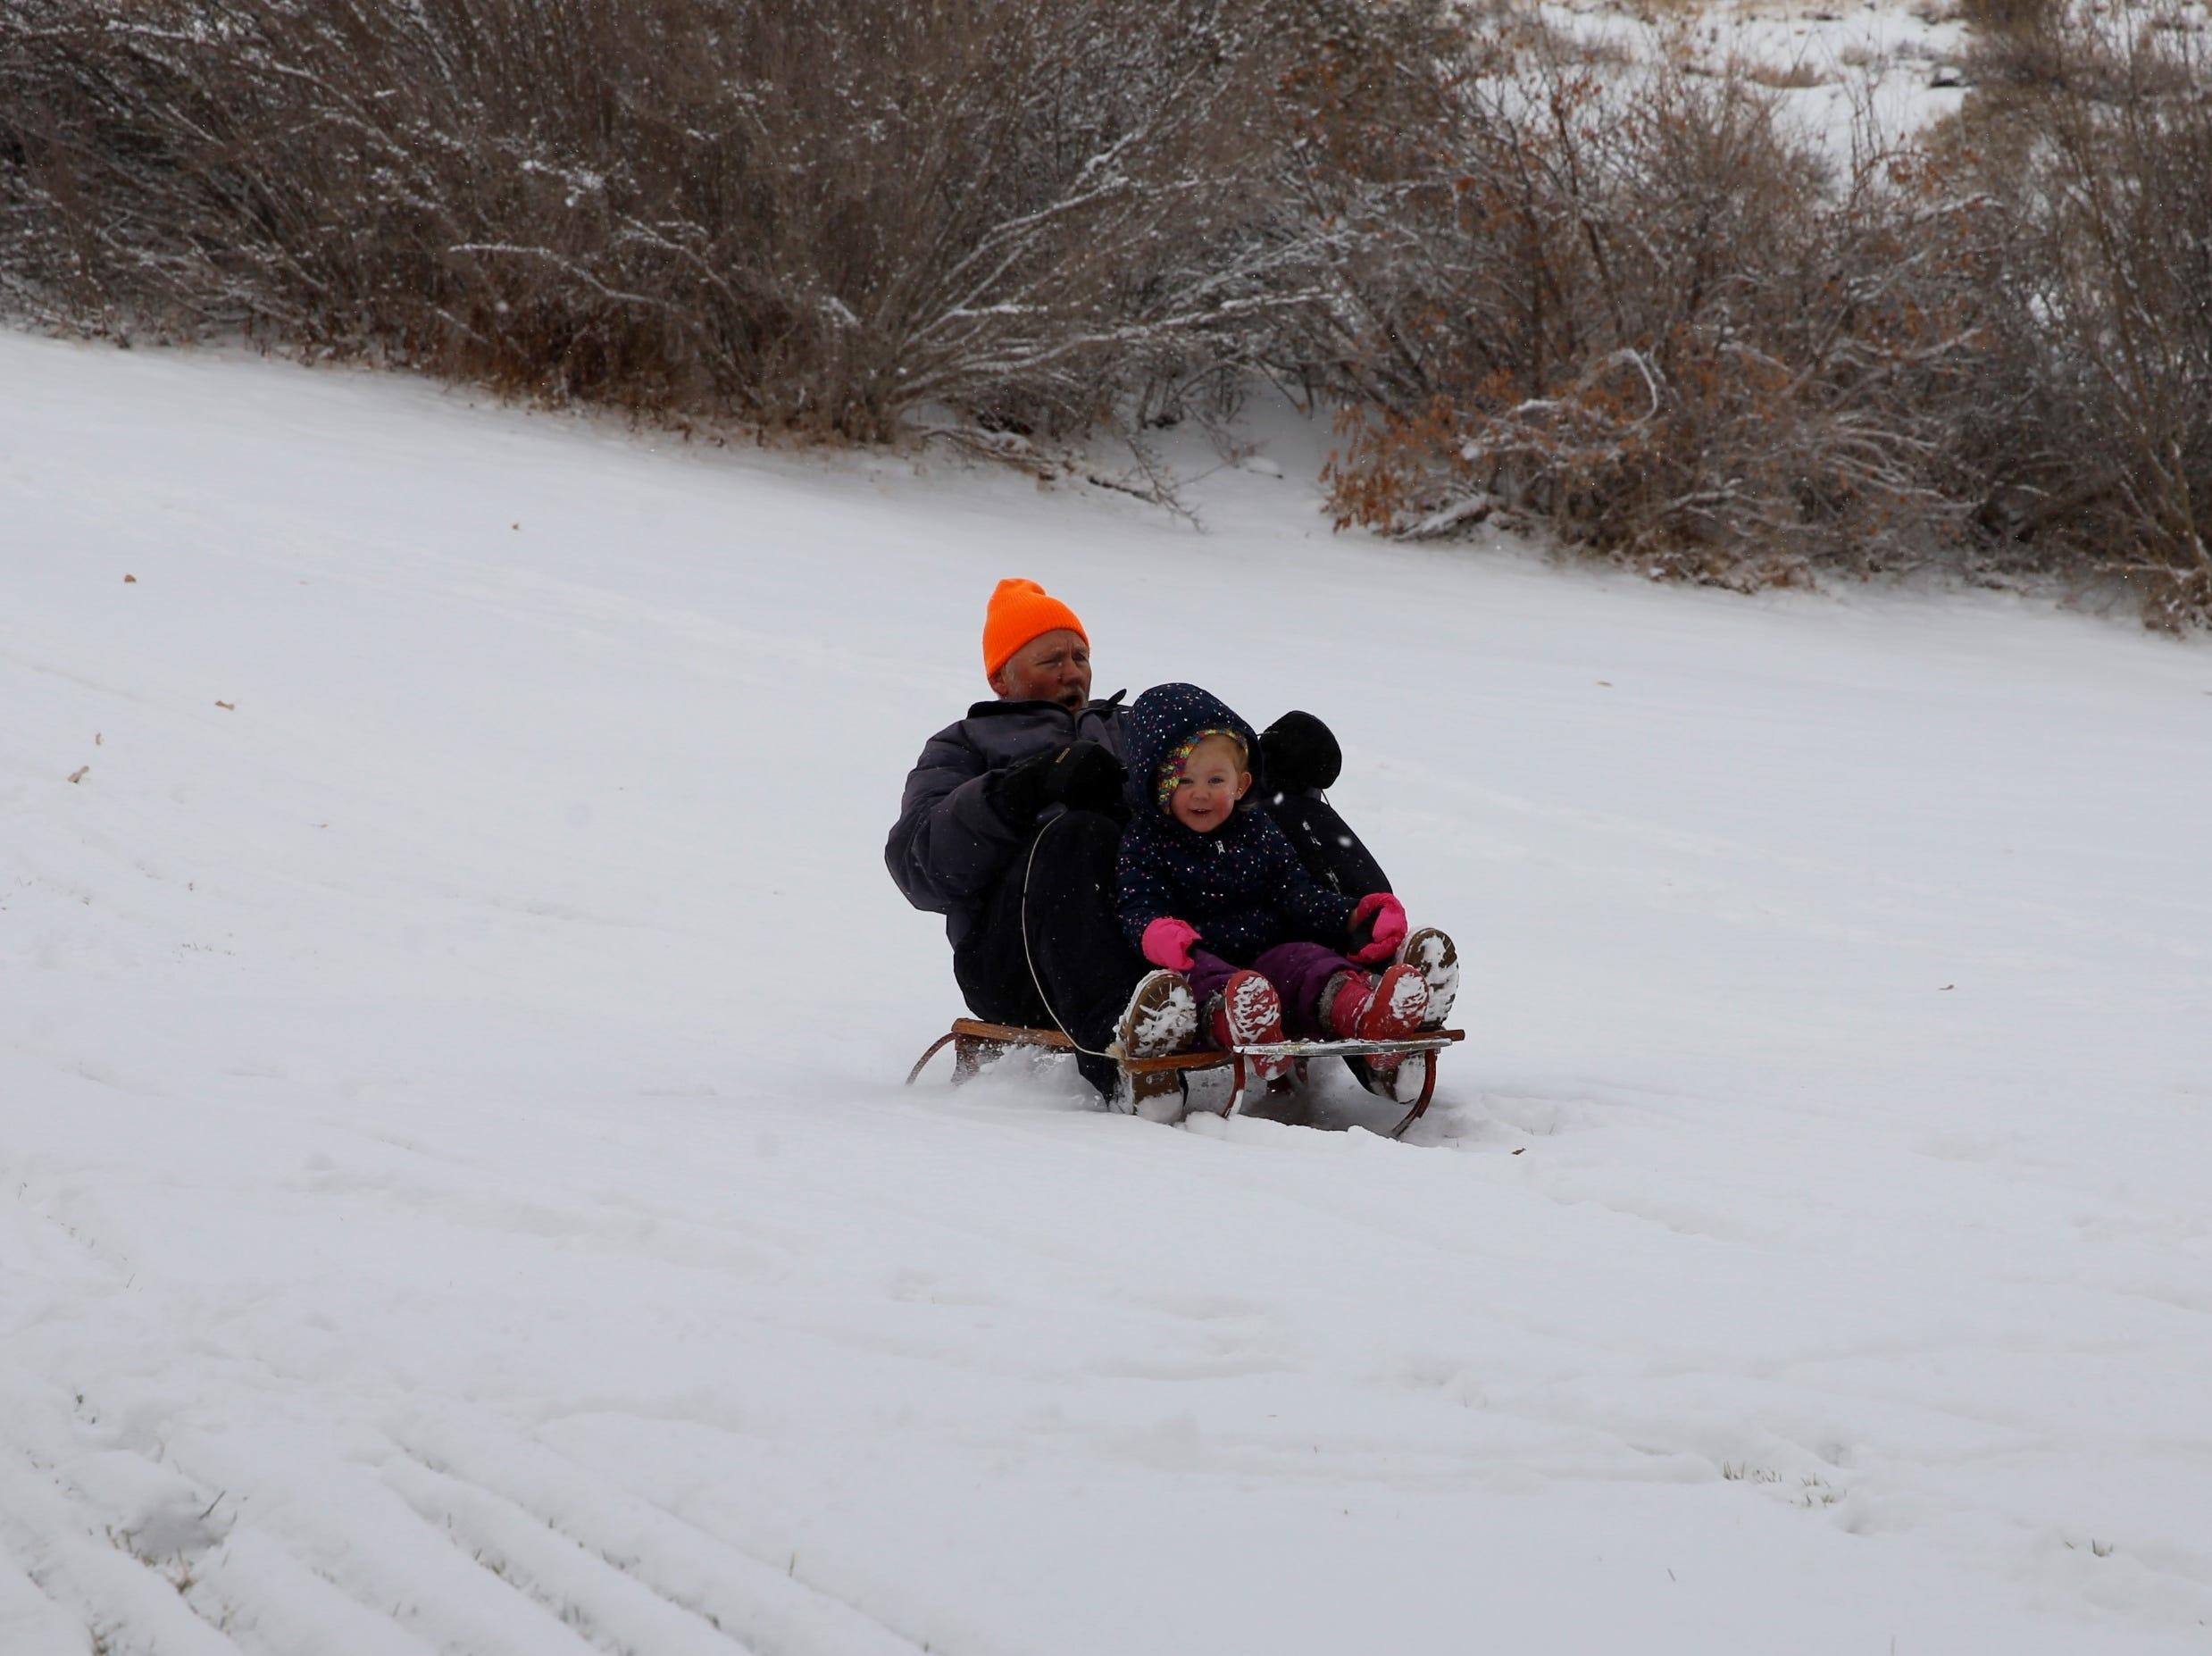 Ken McDonald took his three-year-old granddaughter sledding on Friday at Kiwanis Park in Farmington.